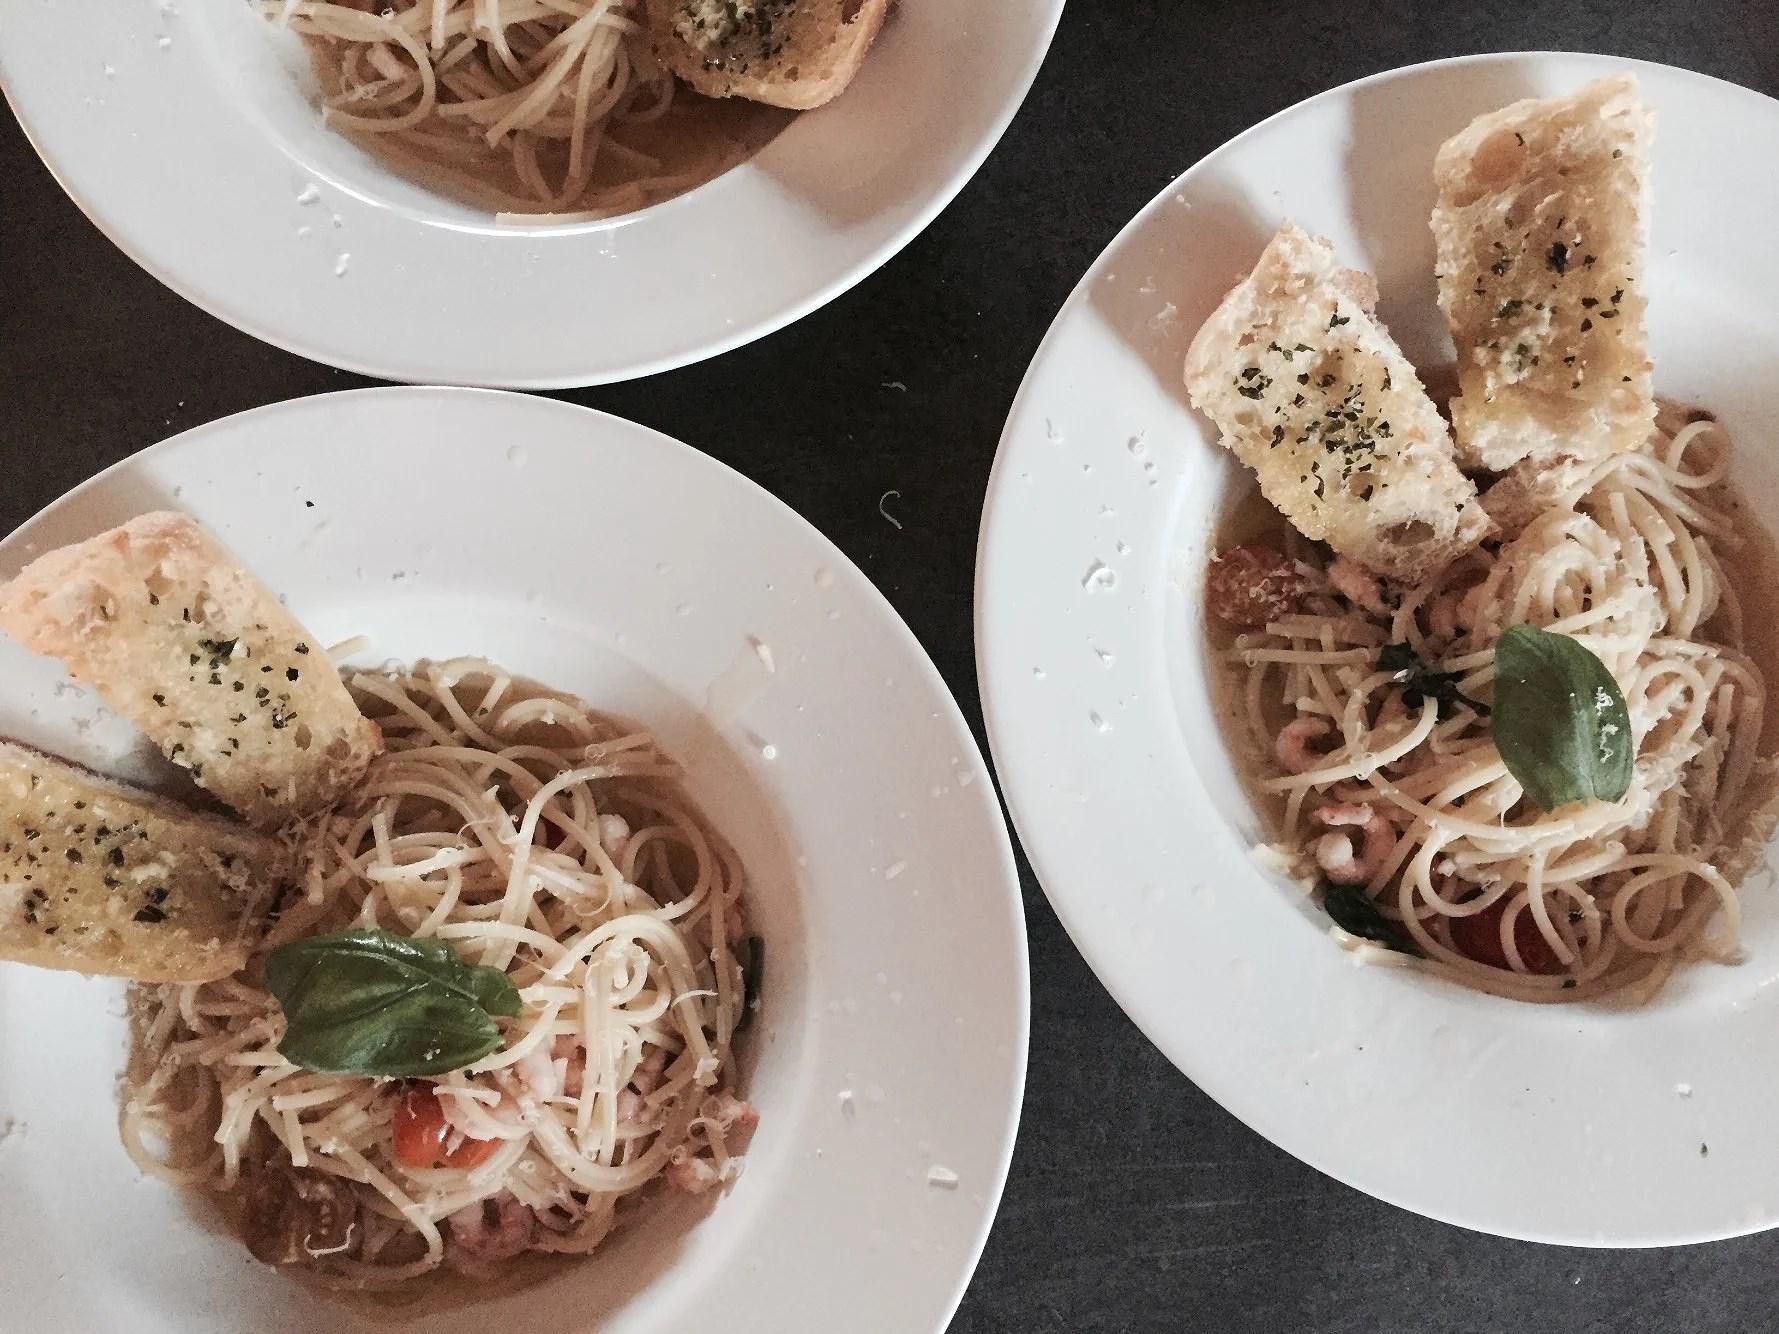 SUNDAY DINNER / 7 PM